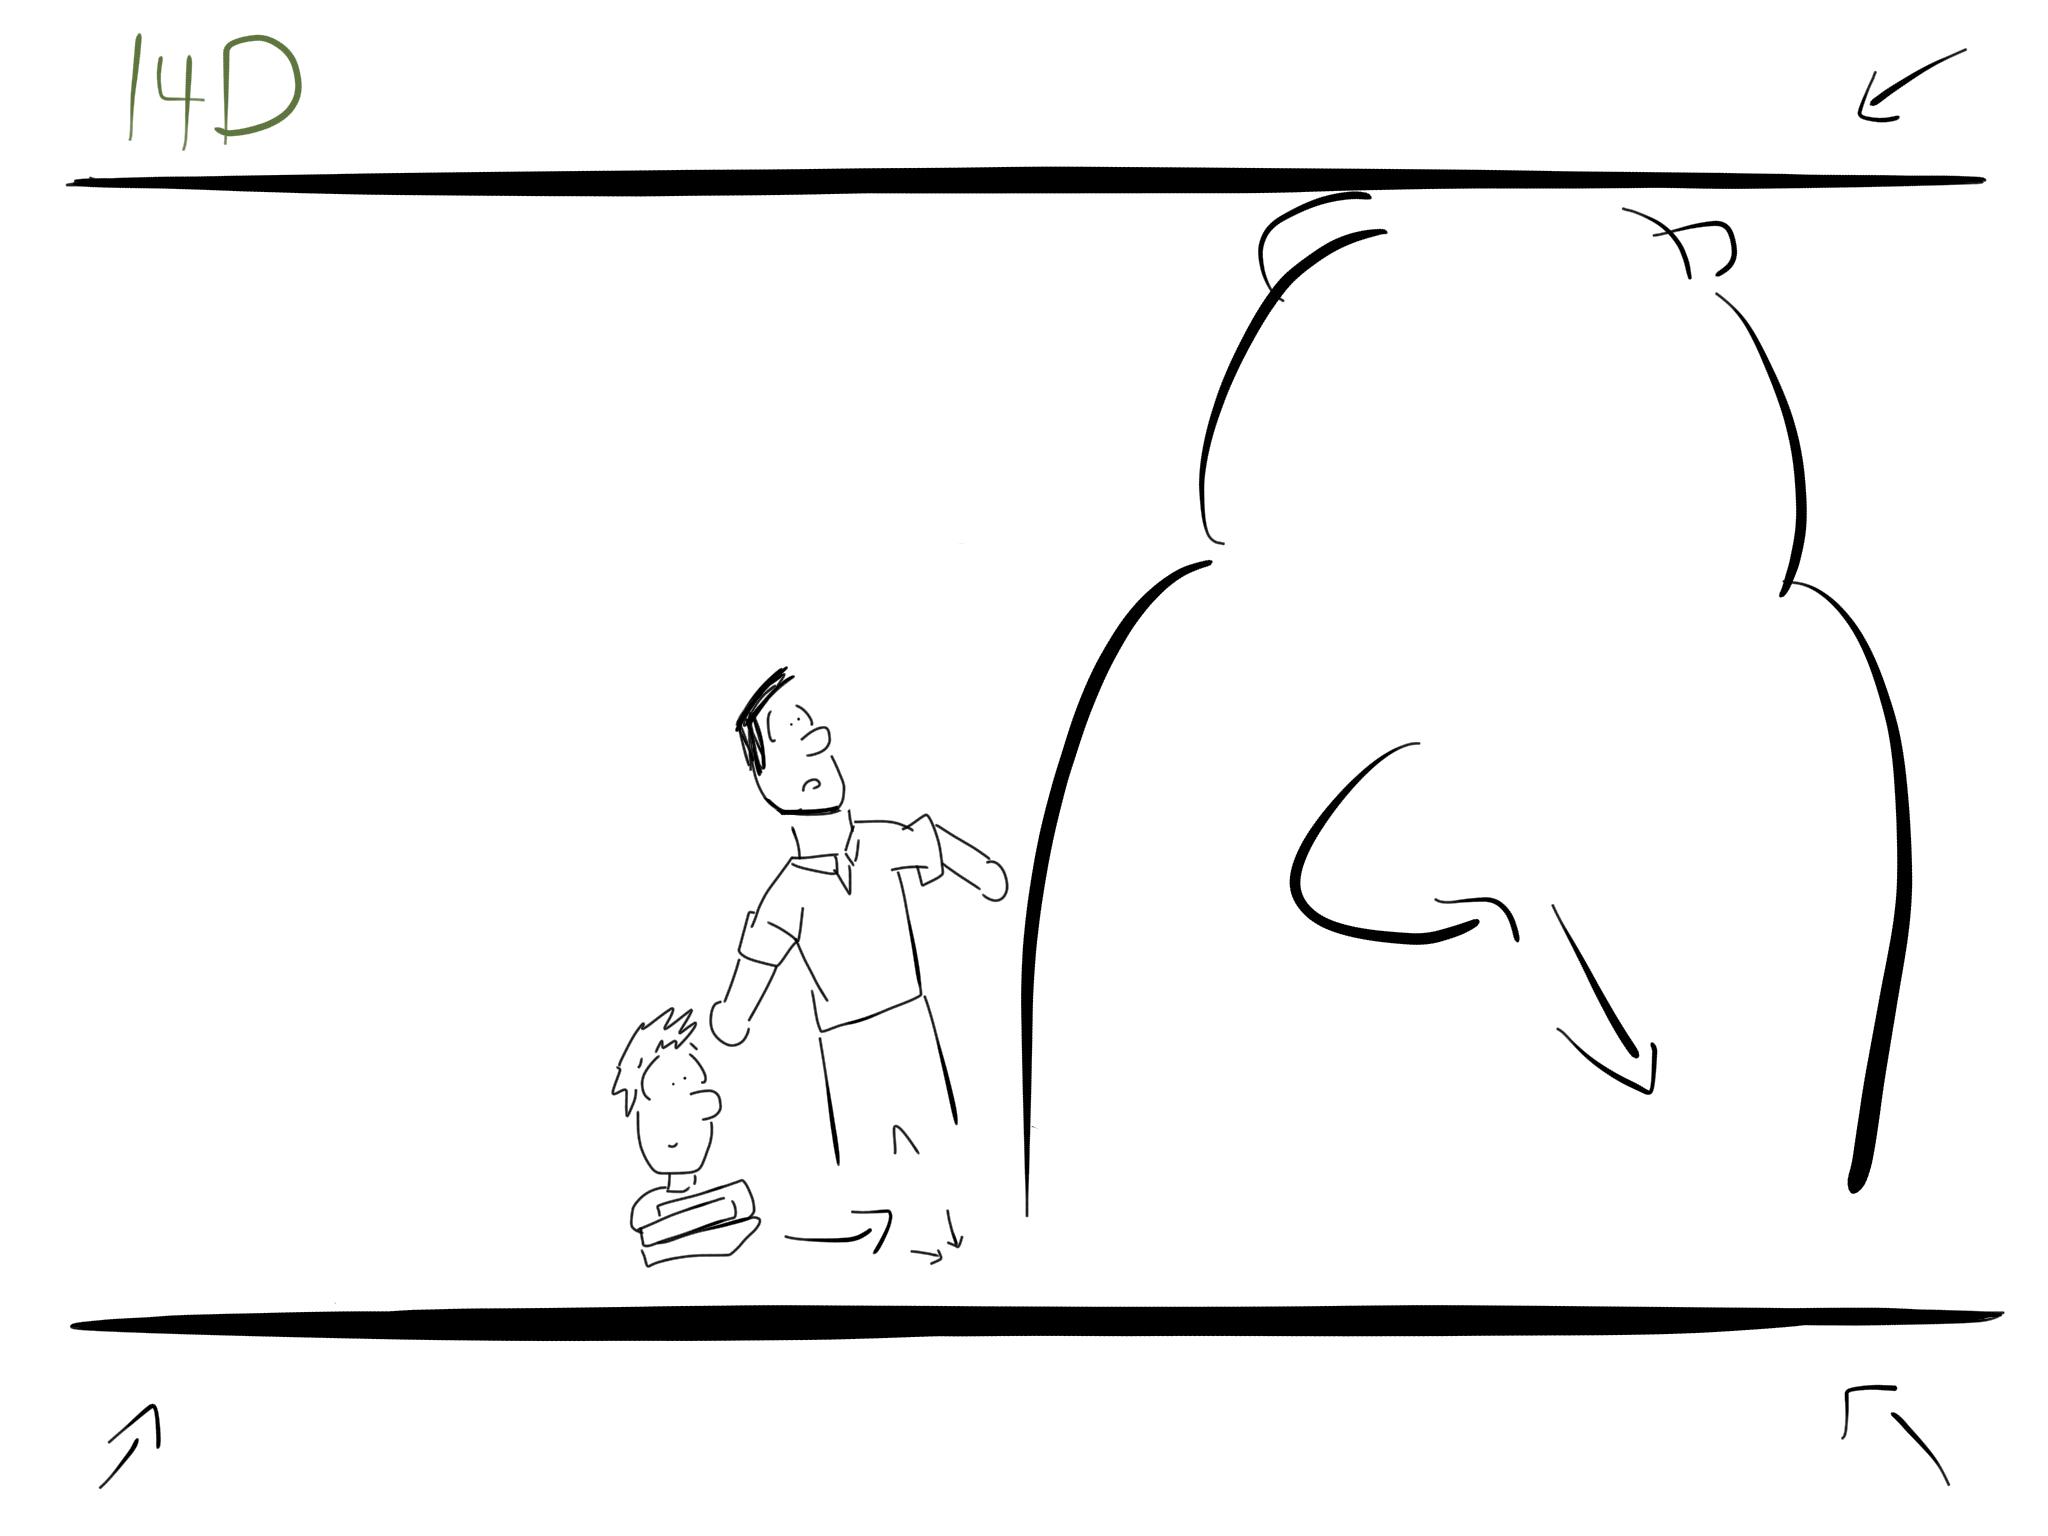 BDF_Storyboards_56.jpg